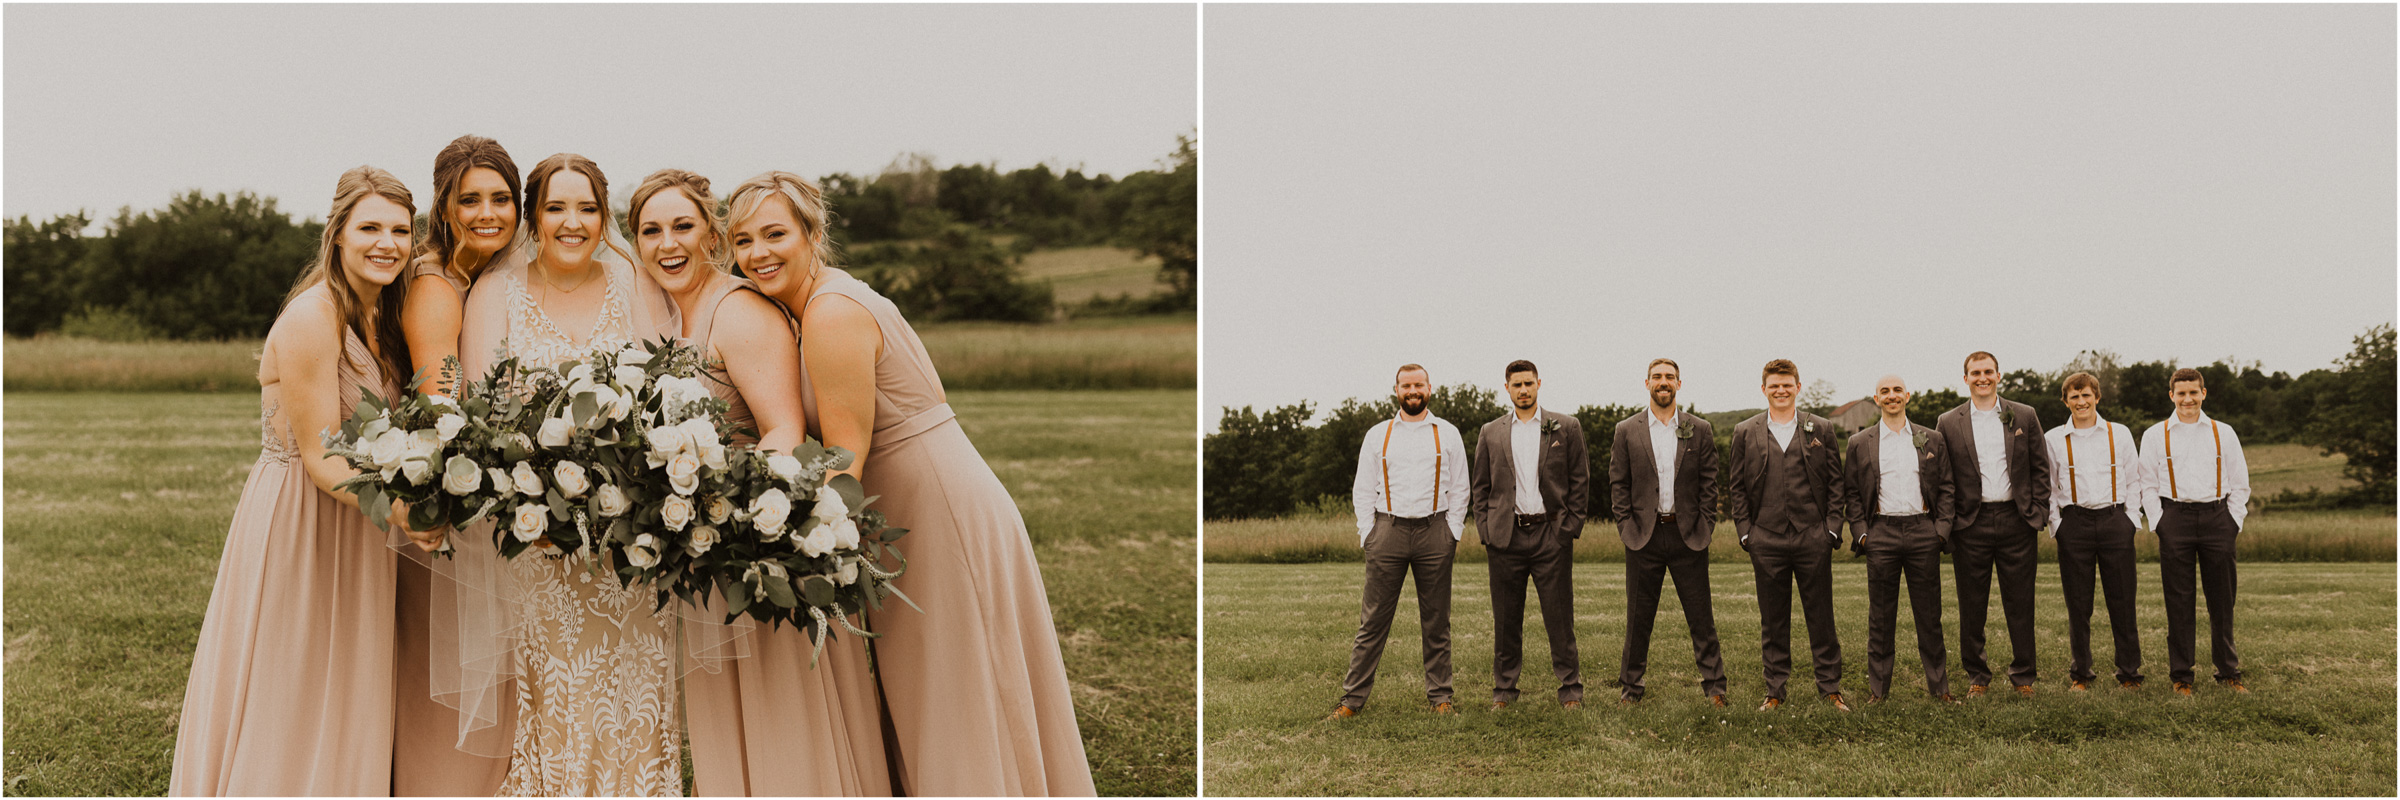 alyssa barletter photography weston red barn farm timberbarn summer outdoor wedding-30.jpg